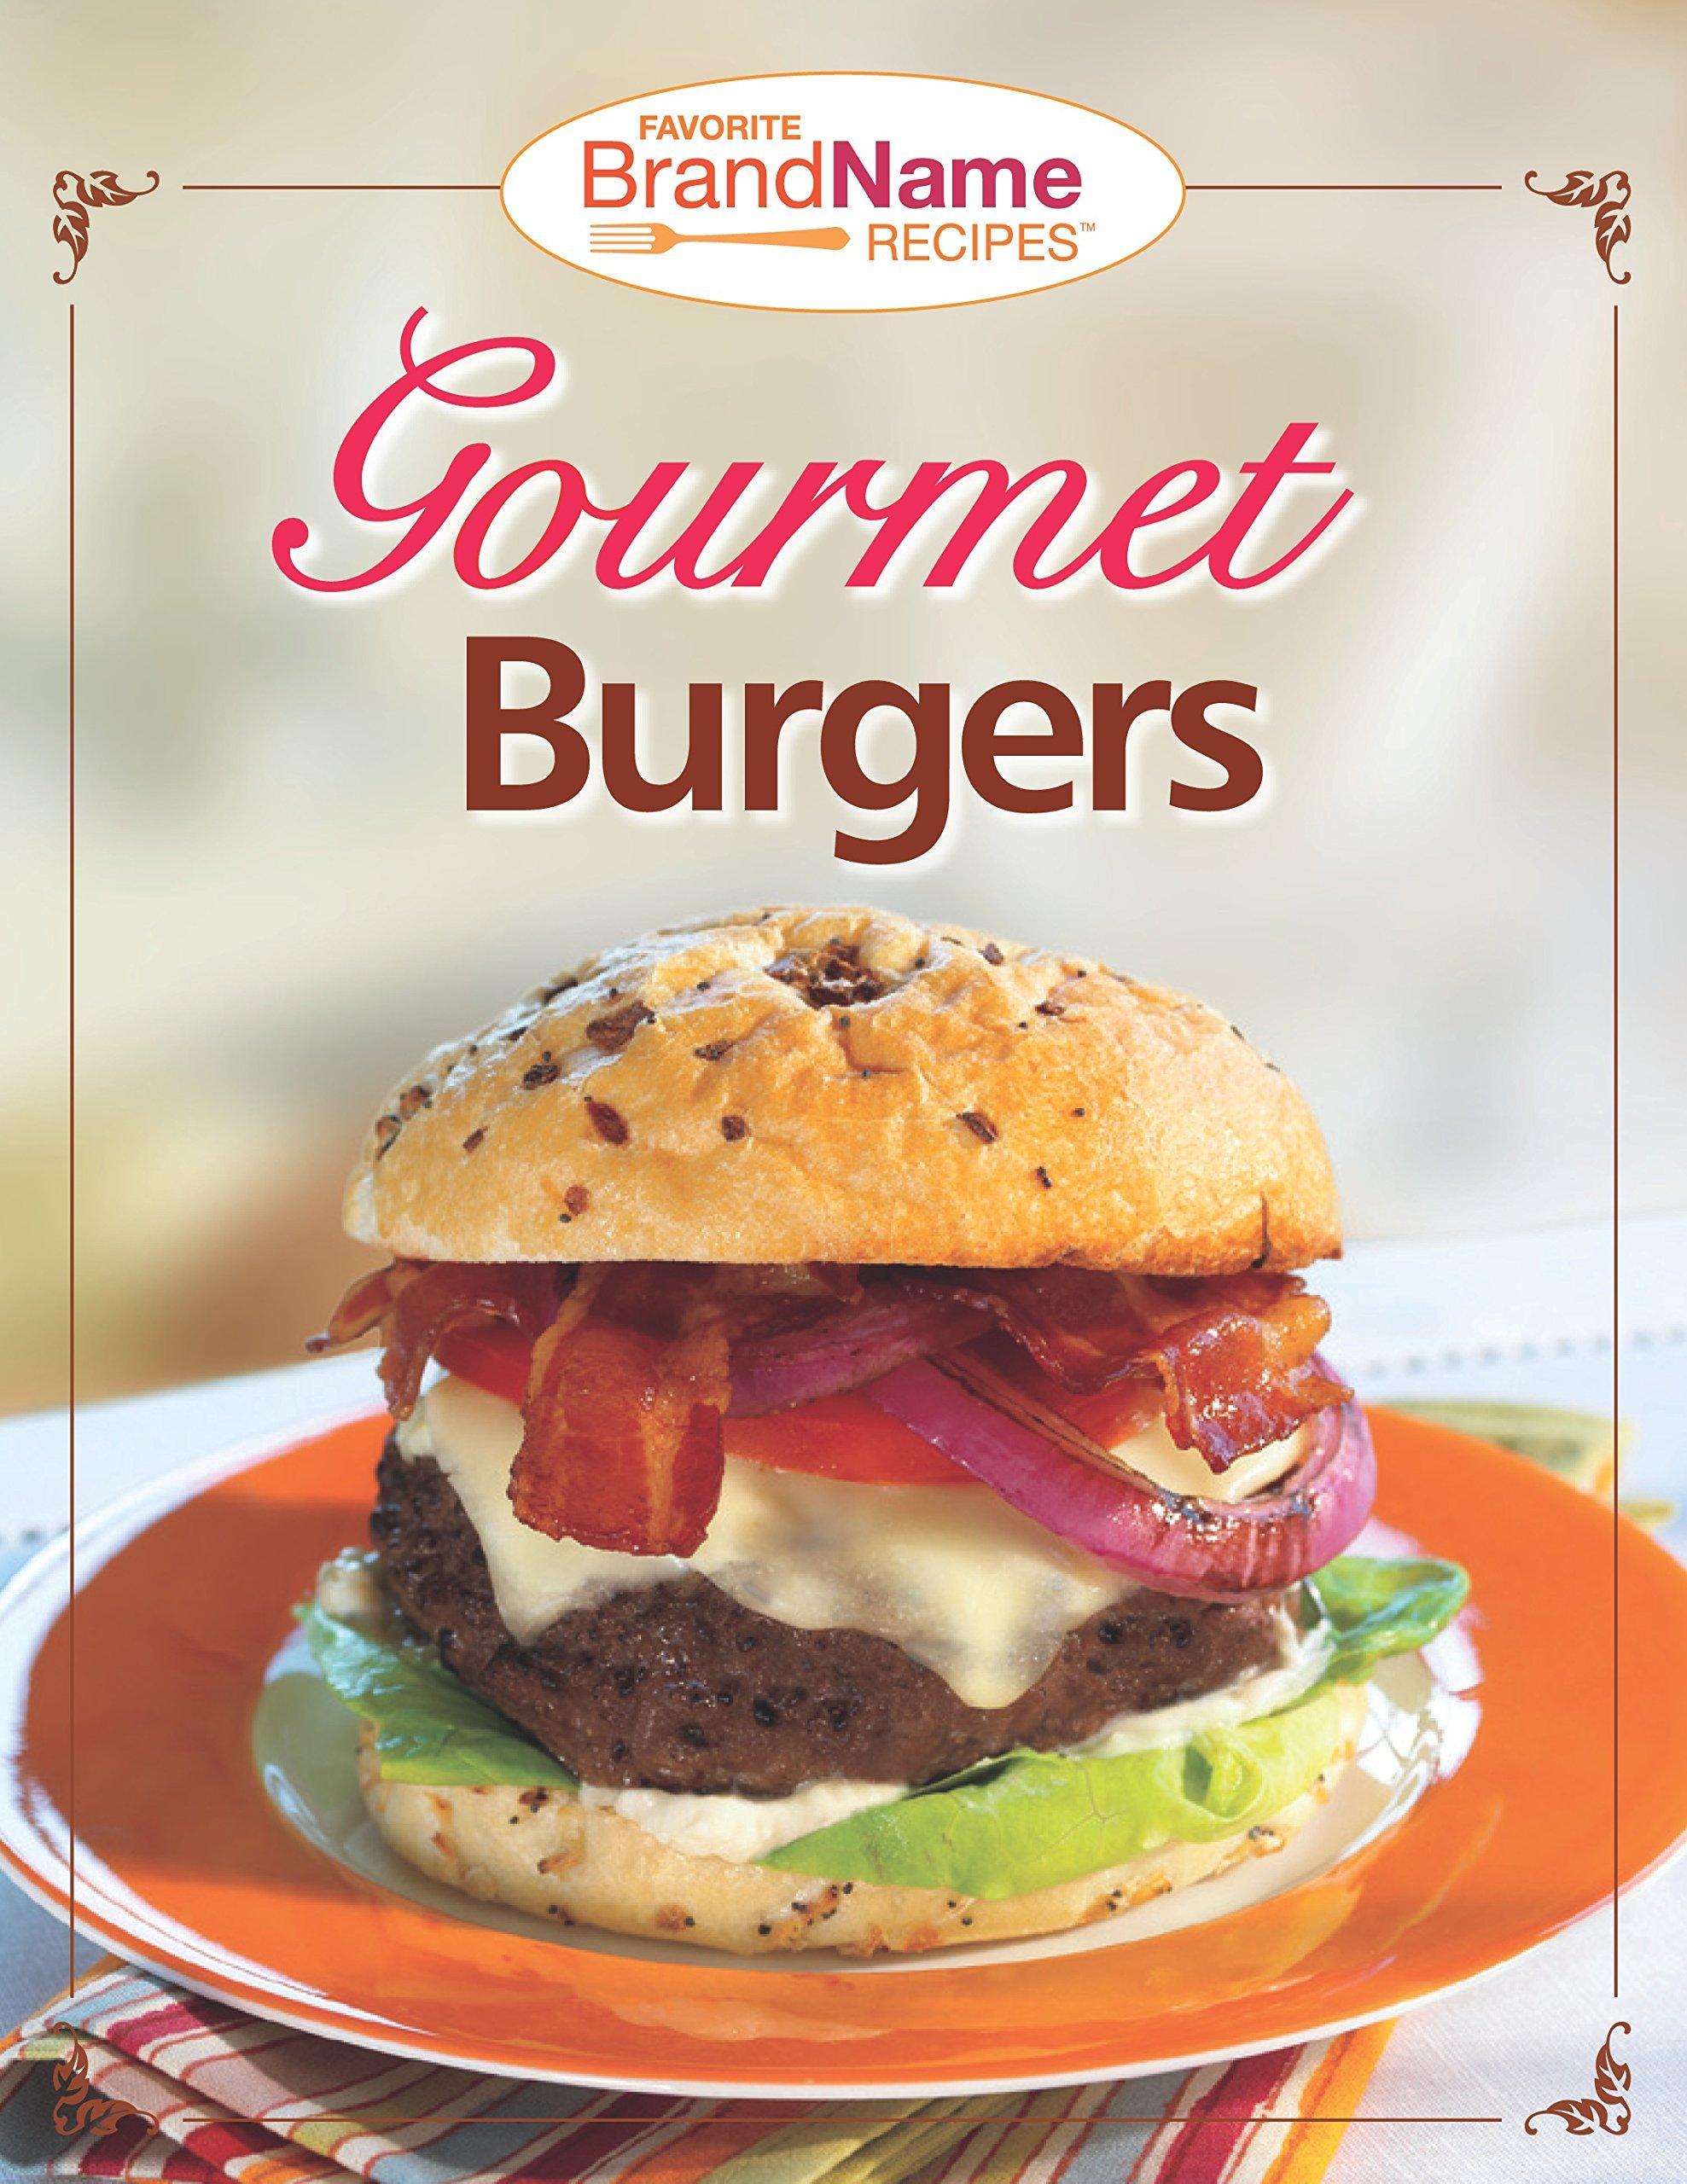 Favorite Brand Name Recipes™ - Gourmet Burgers PDF